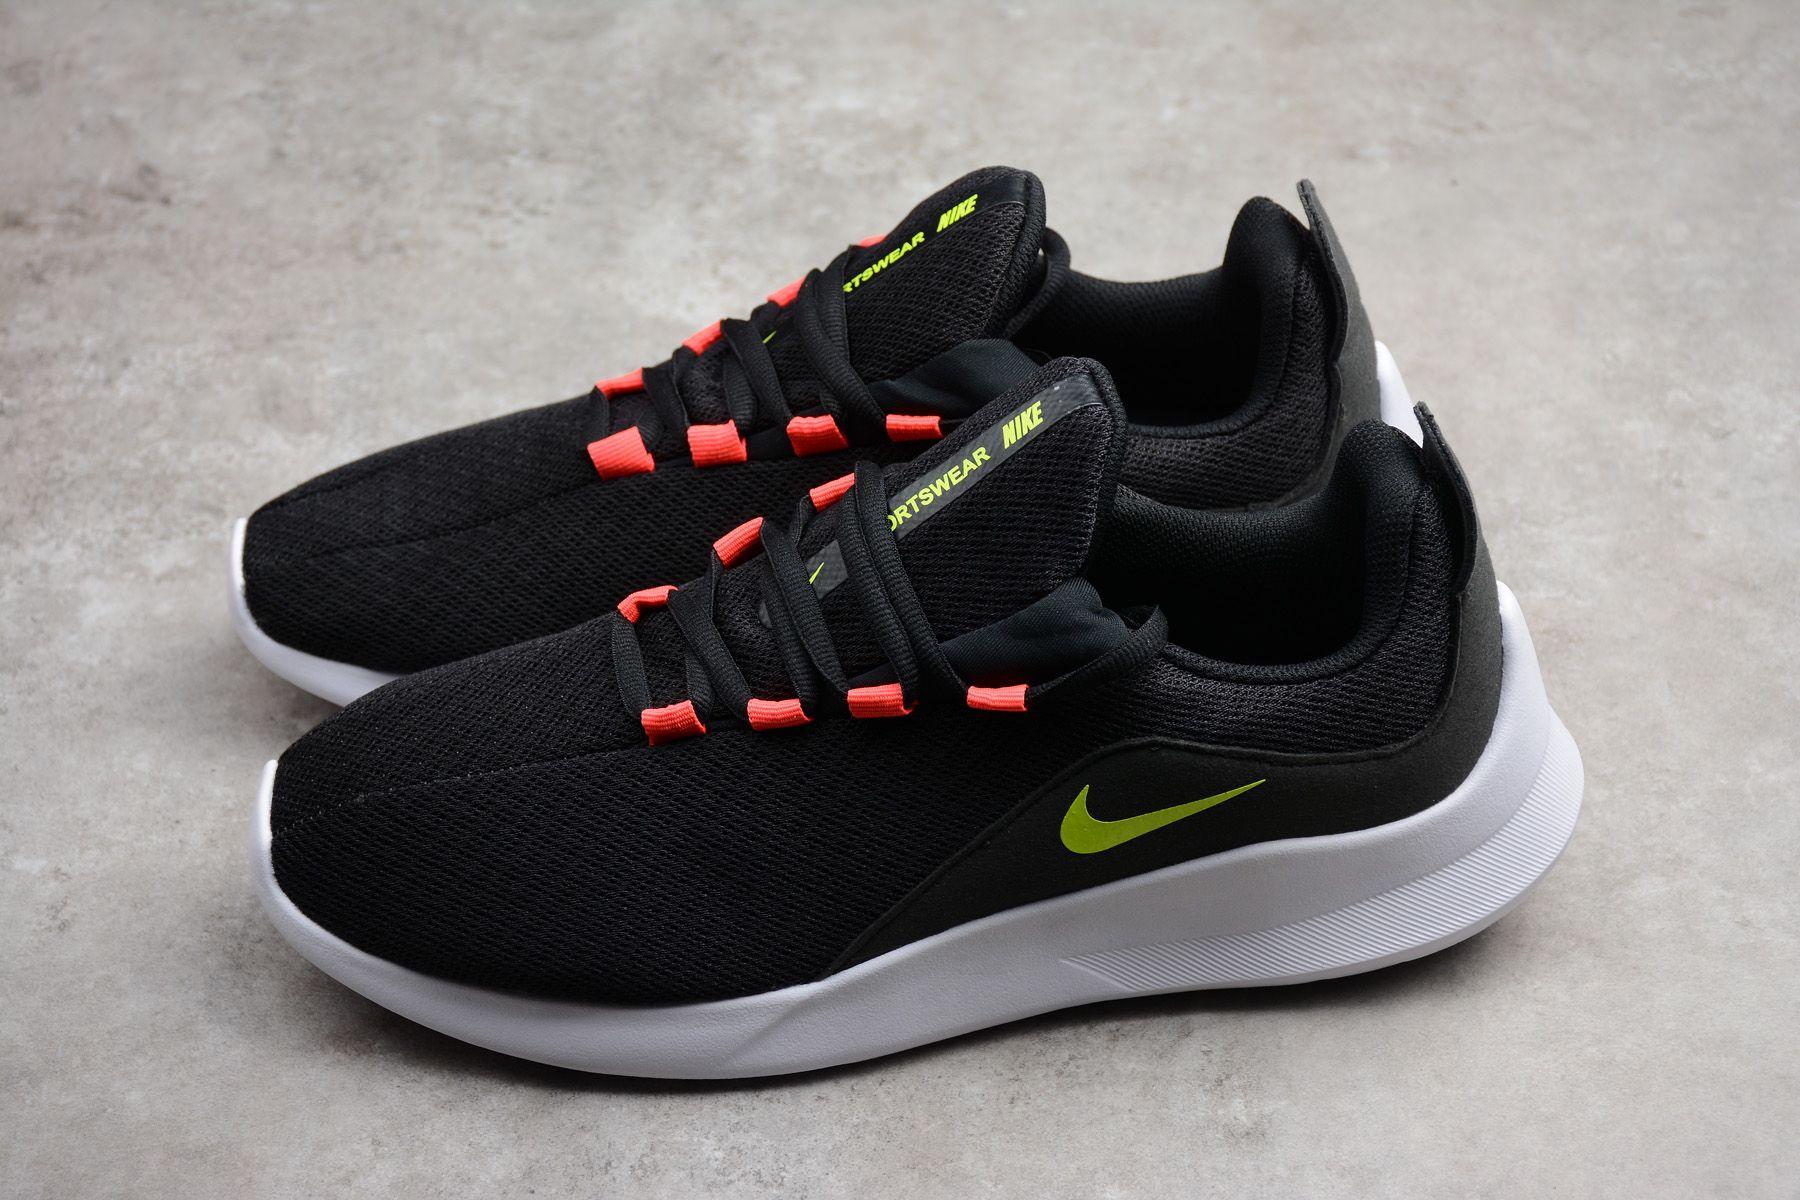 65ec40364f6 Nike Viale Black Volt-Solar Red-White AA2181-001 shoes for men